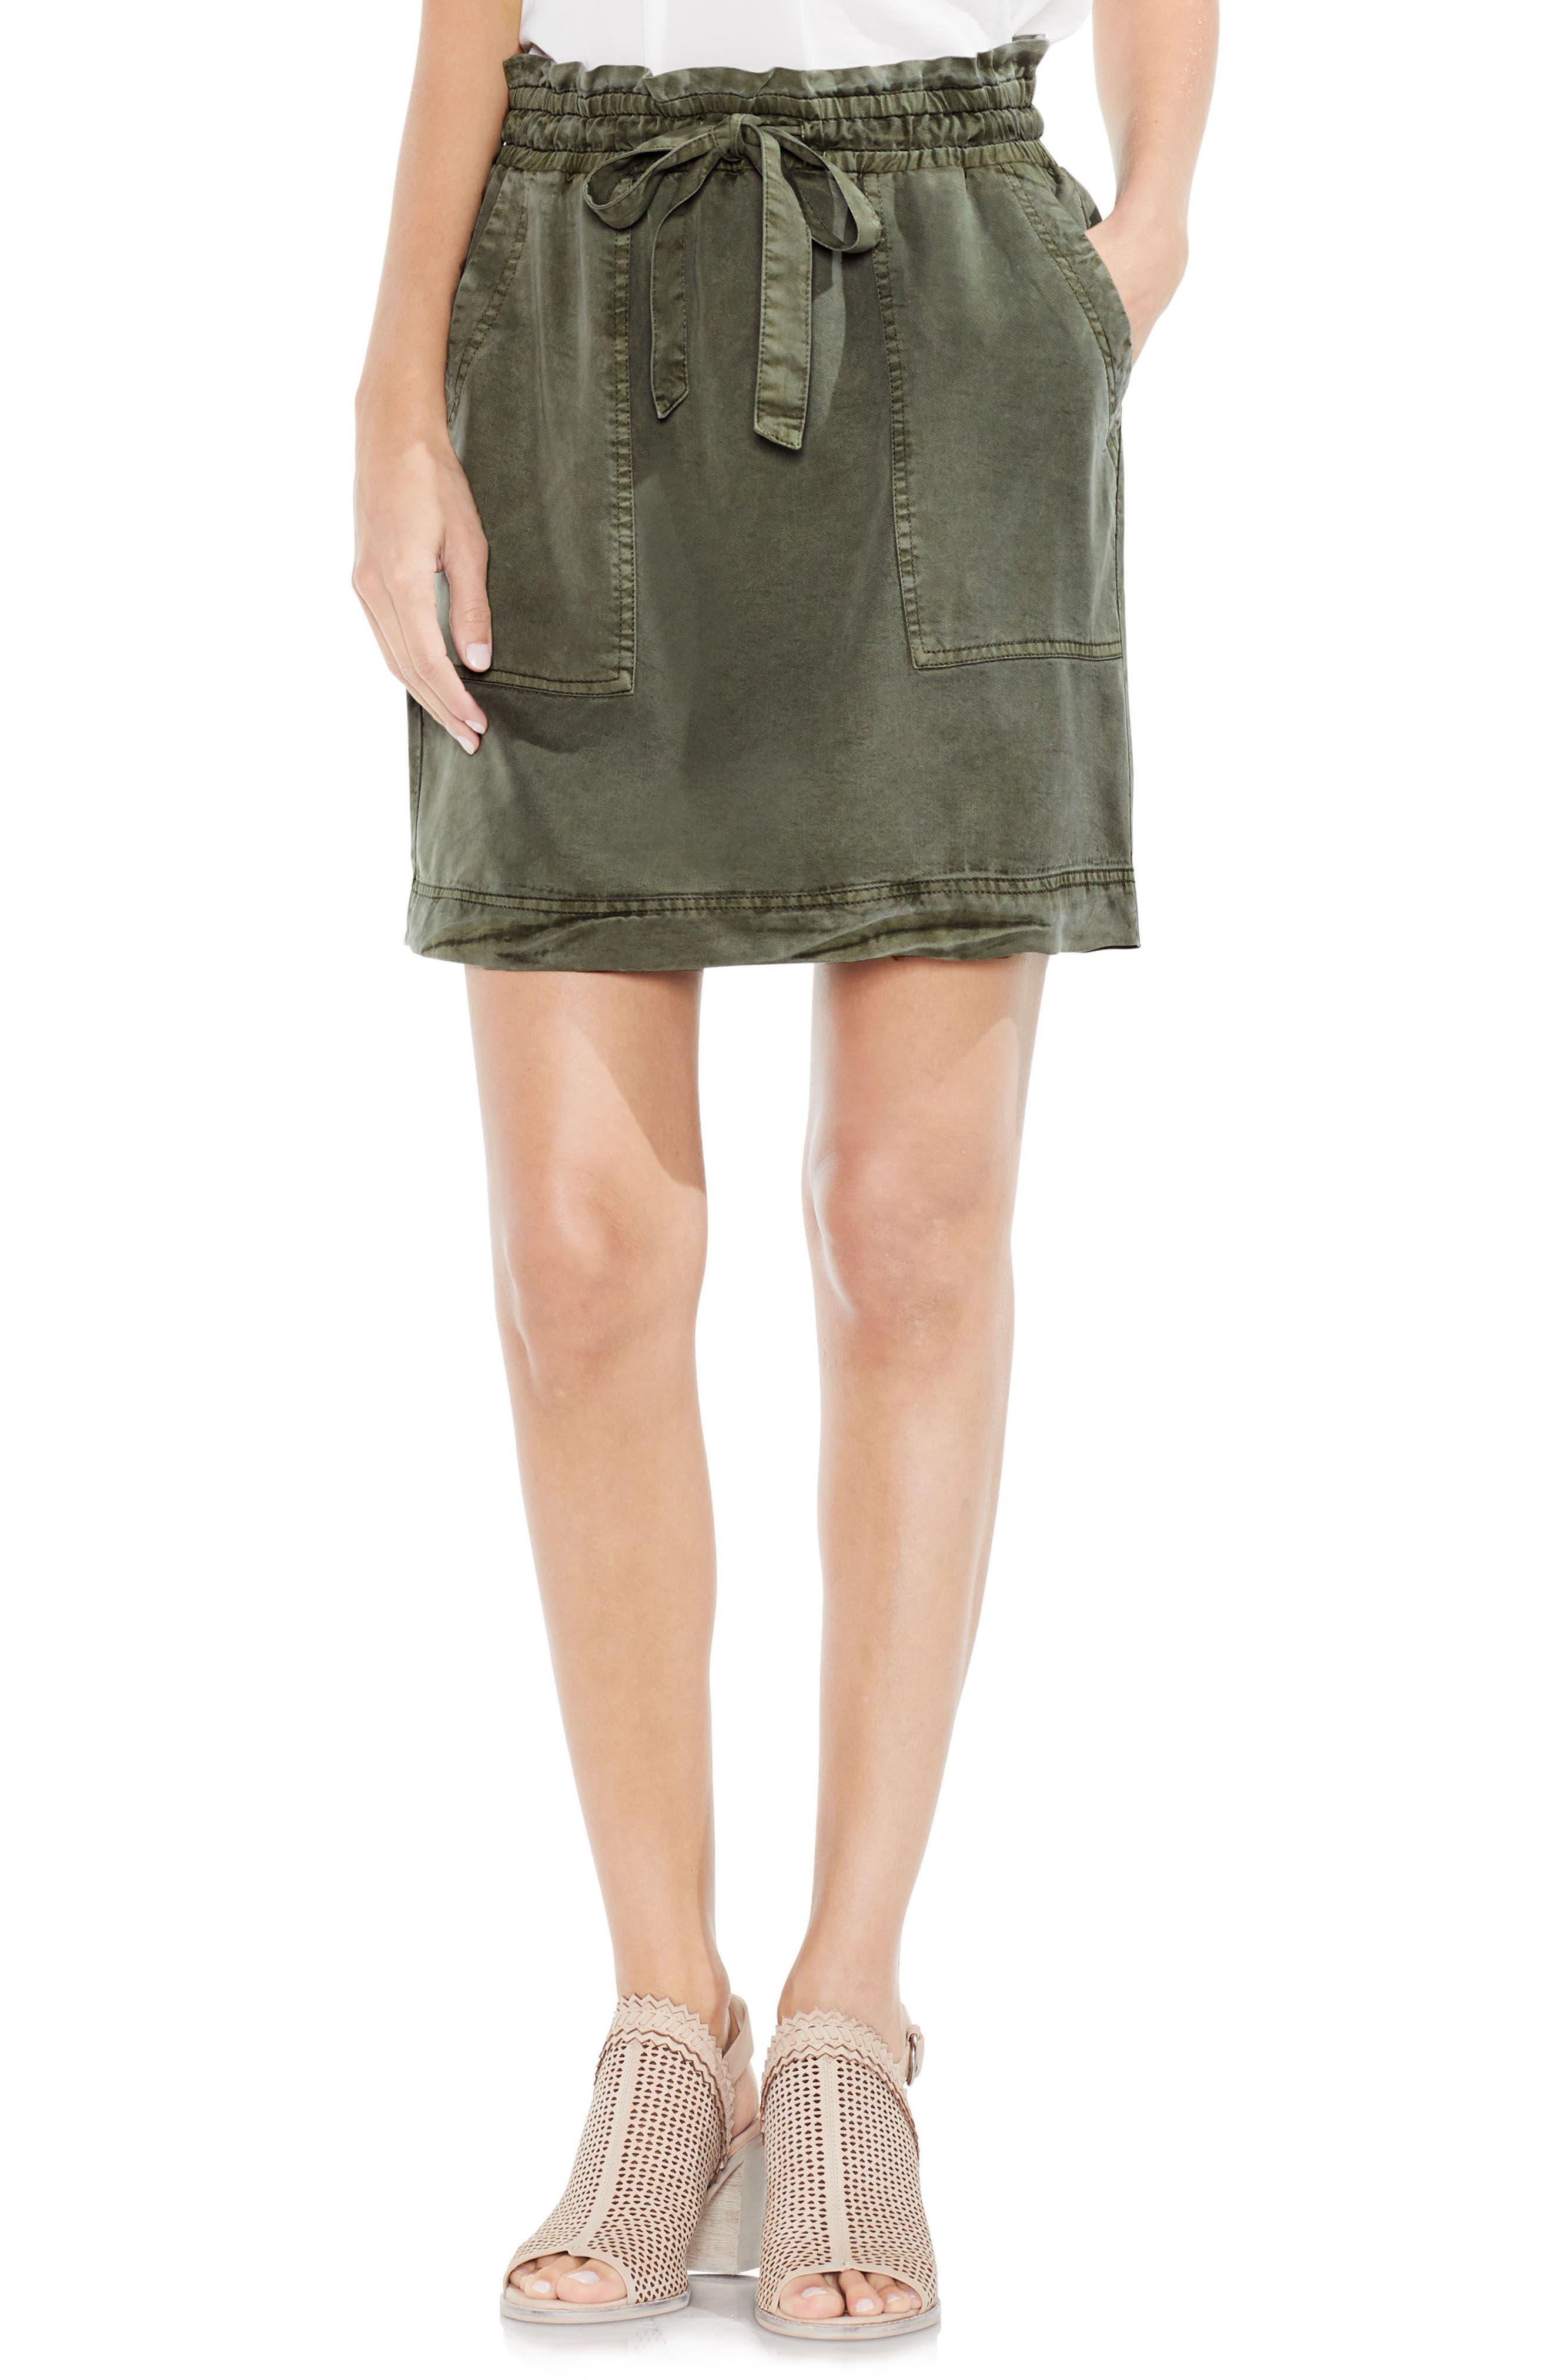 Alternate Image 1 Selected - Vince Camuto Drawstring Waist Tencel® Skirt